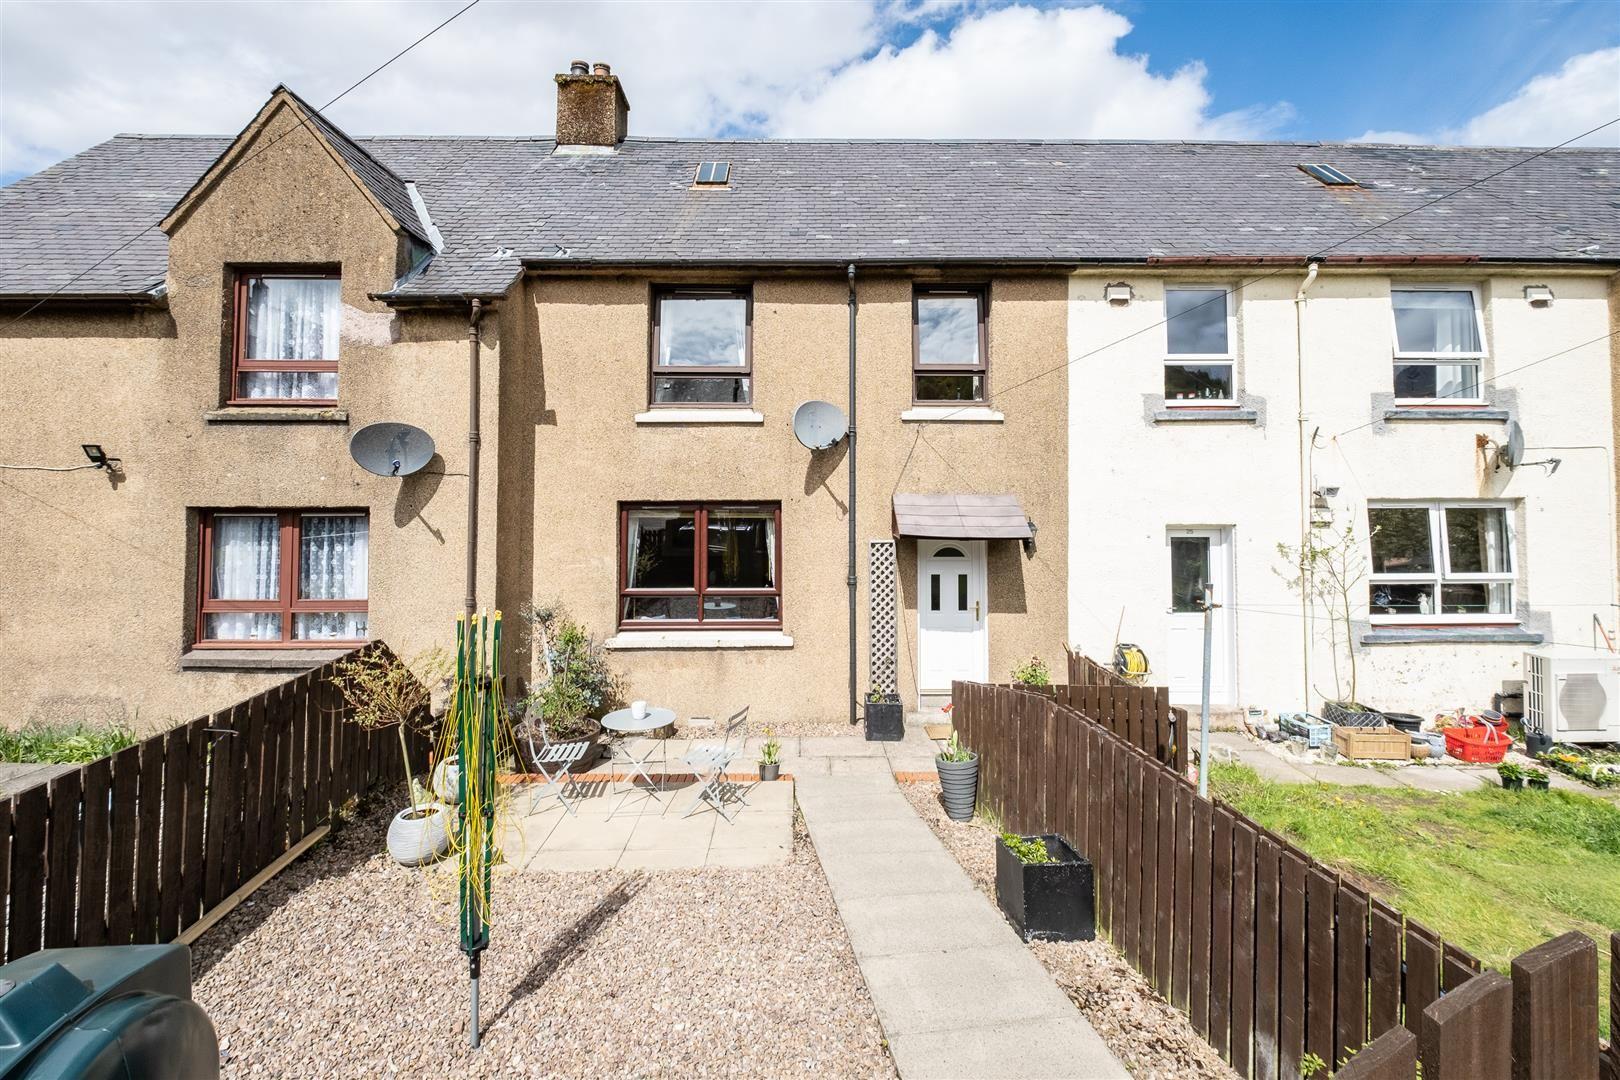 Property photo 1 of 22. 20210511-Scotland-Fortwilliam-134336.Jpg